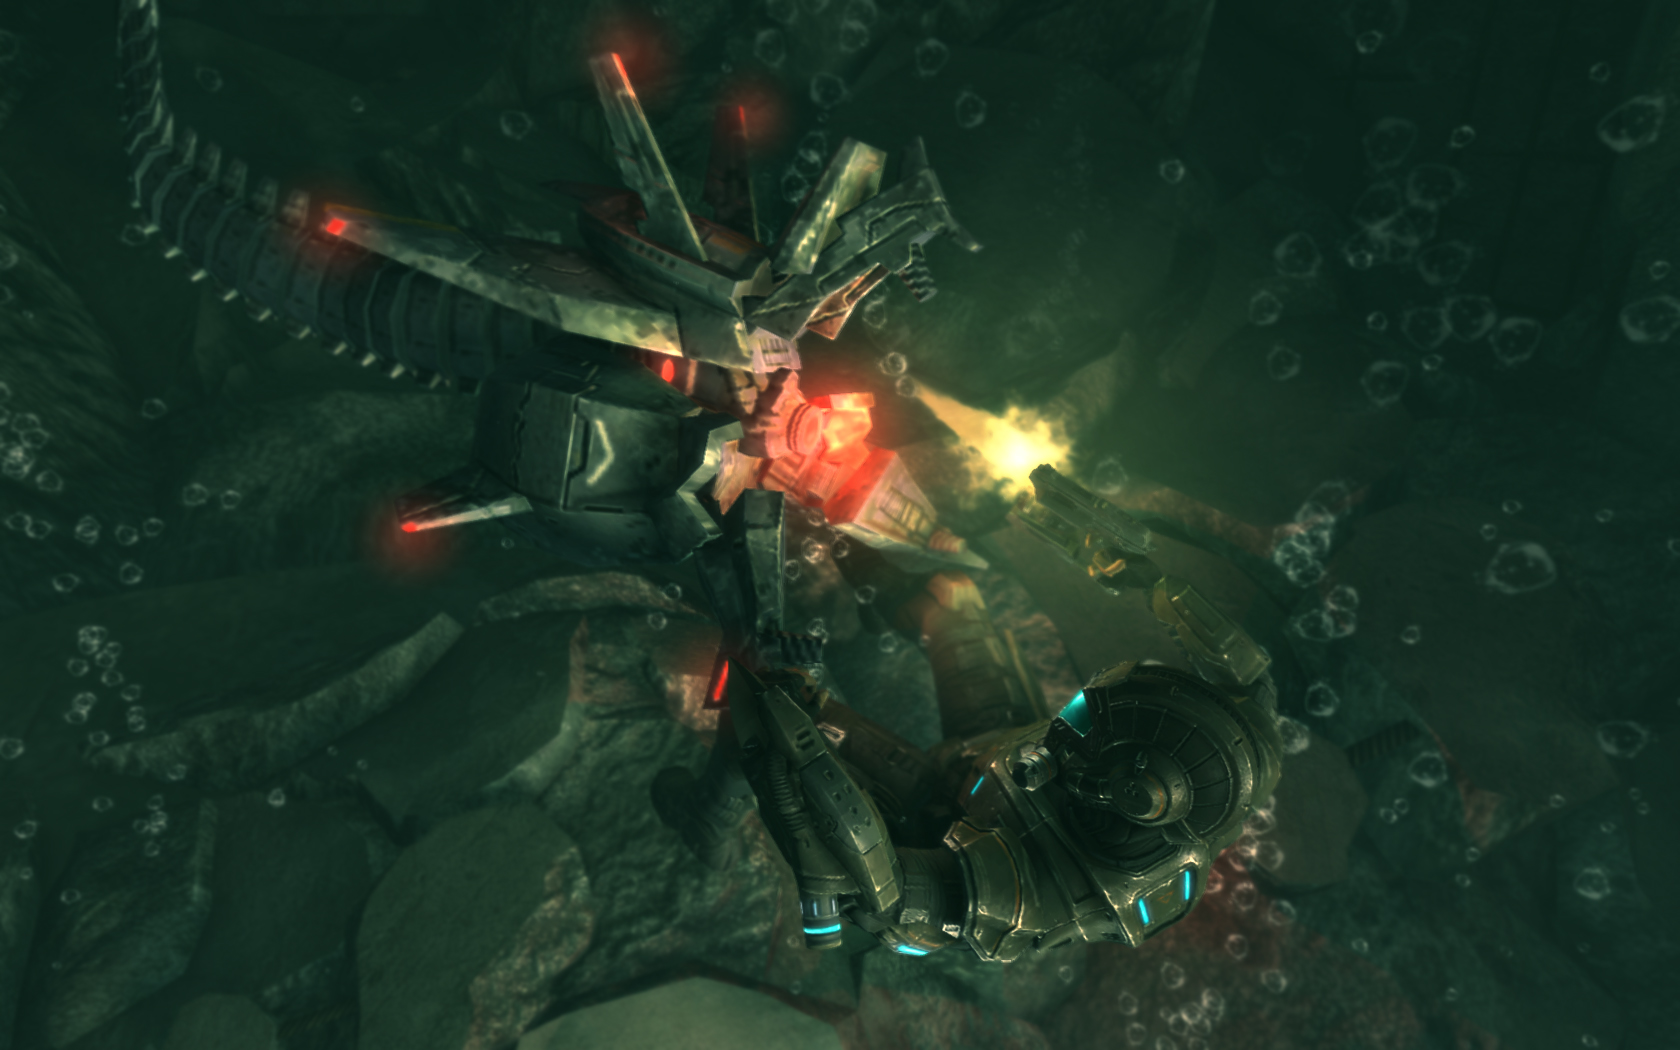 Akce Deep Black inspirovaná u BioShock a Killzone 2 14406